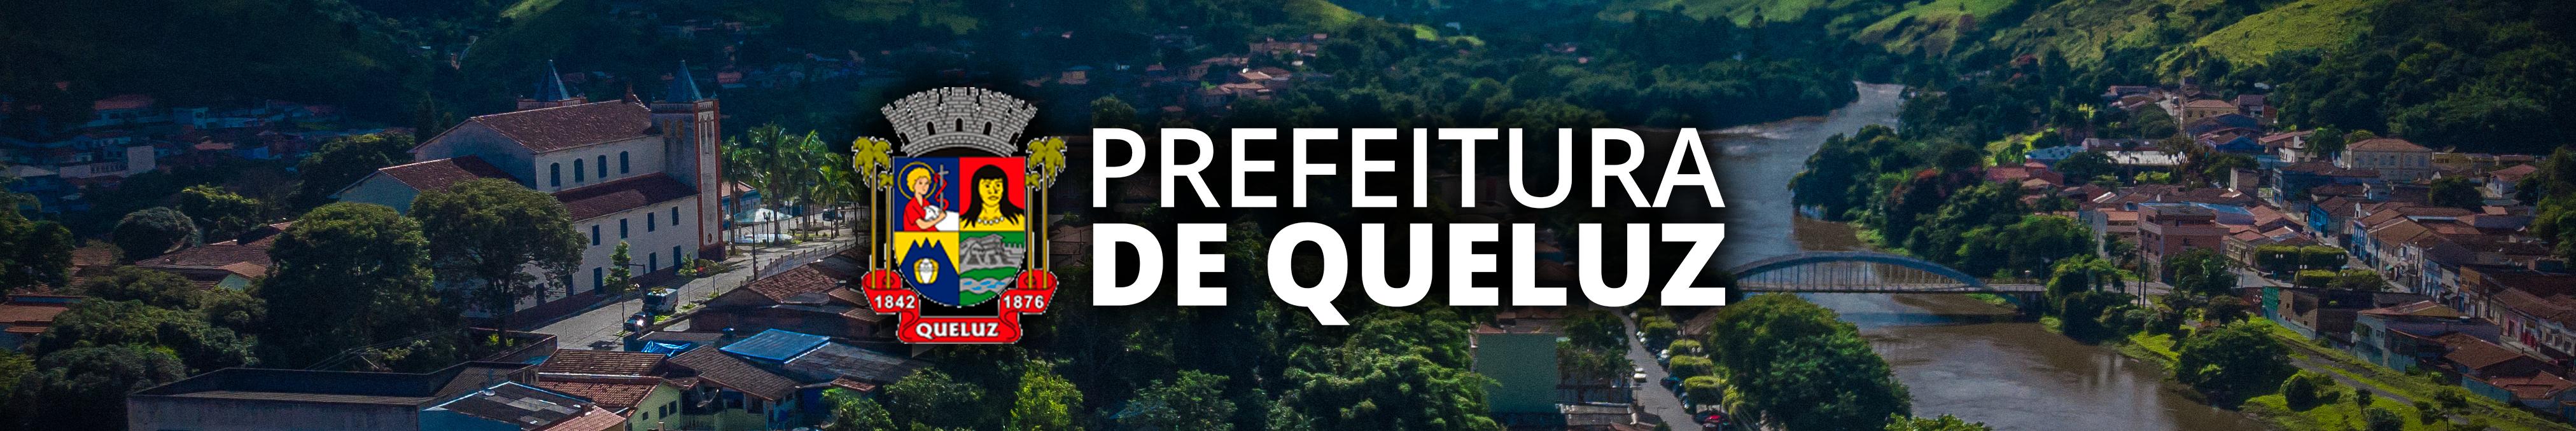 Prefeitura de Queluz – Site Oficial